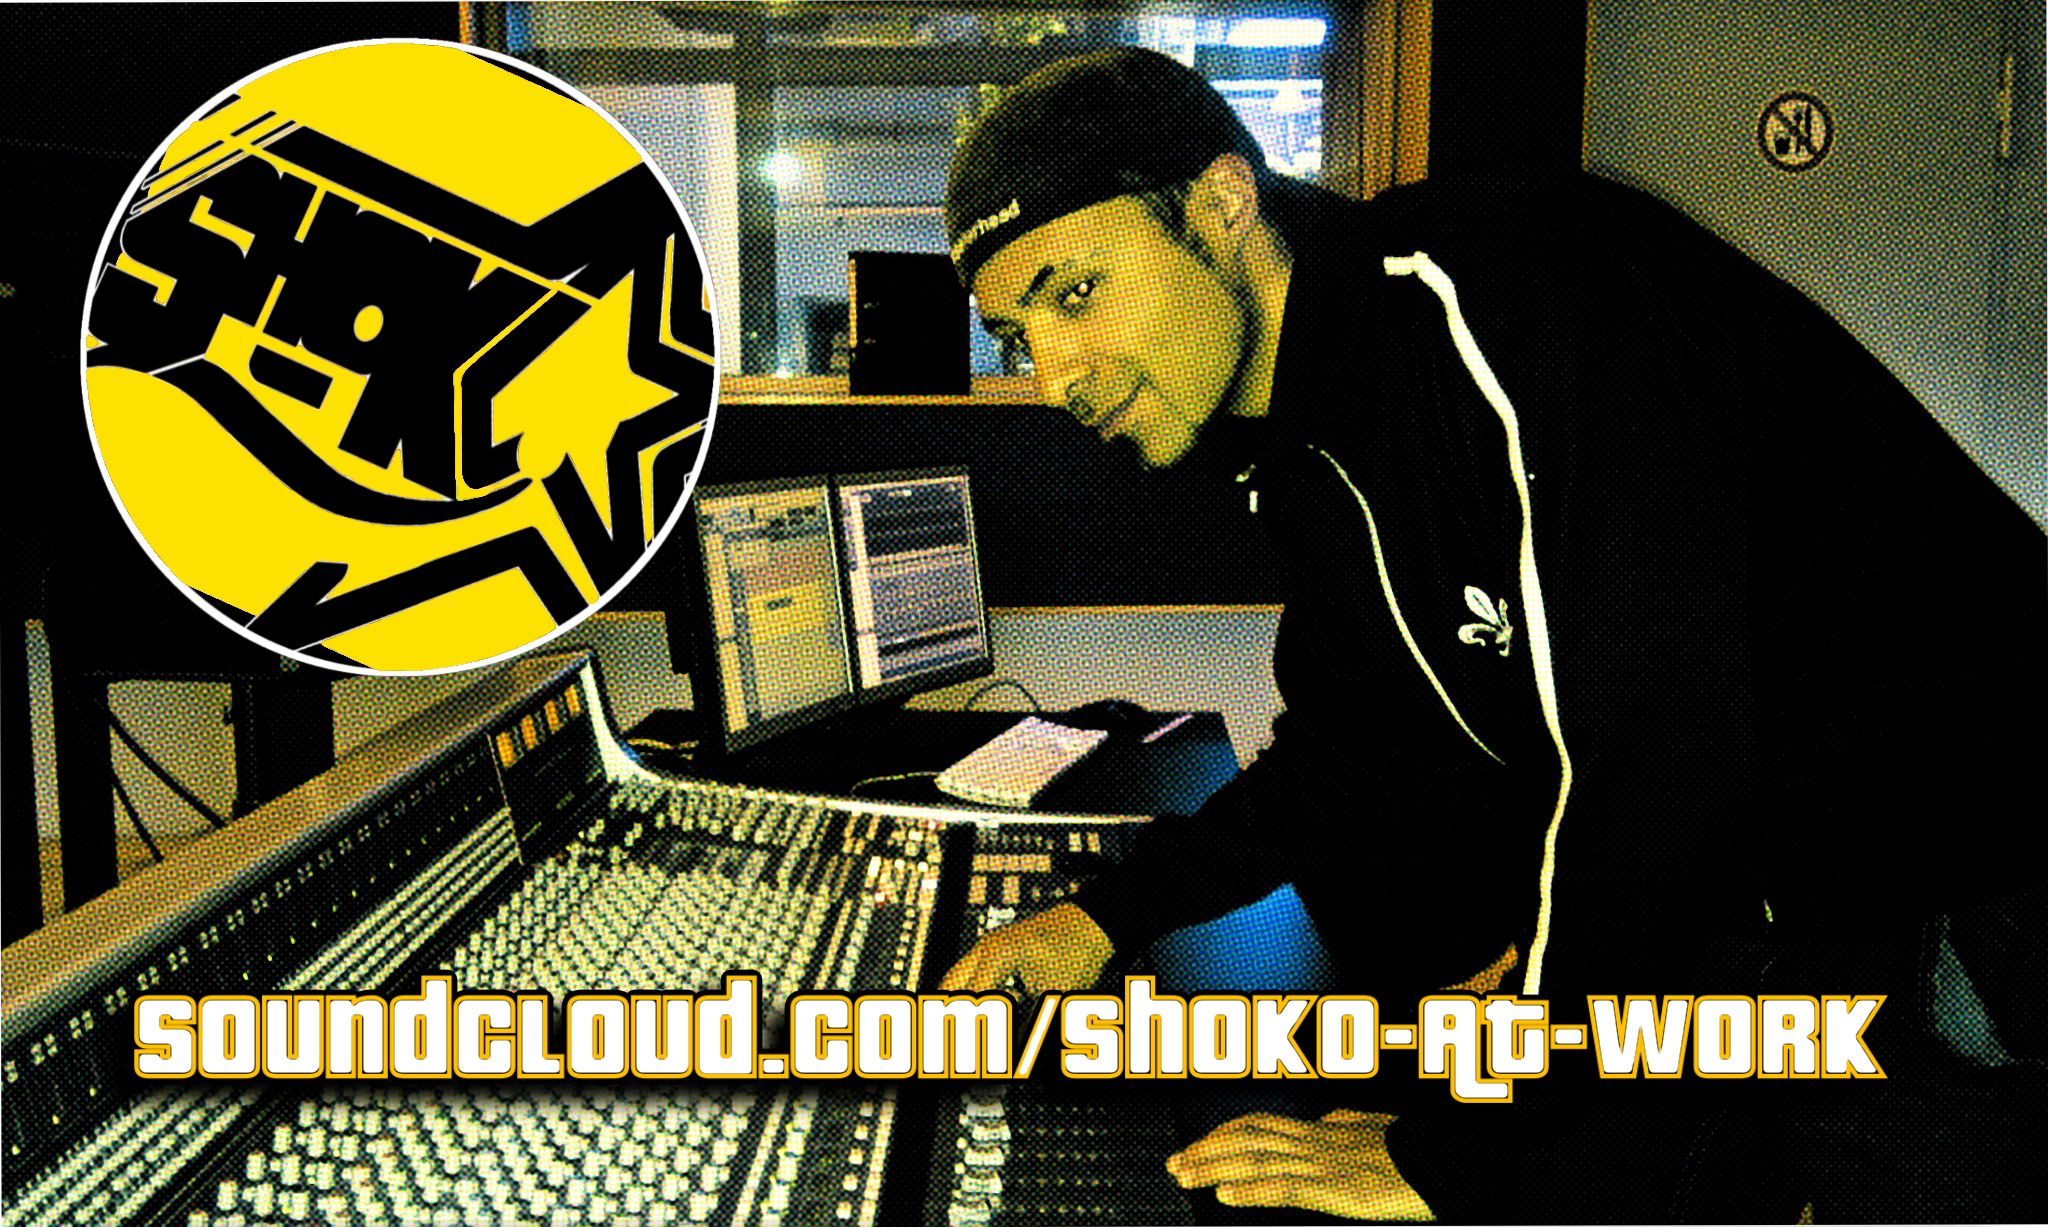 Shokstar_soundcloud_werbung